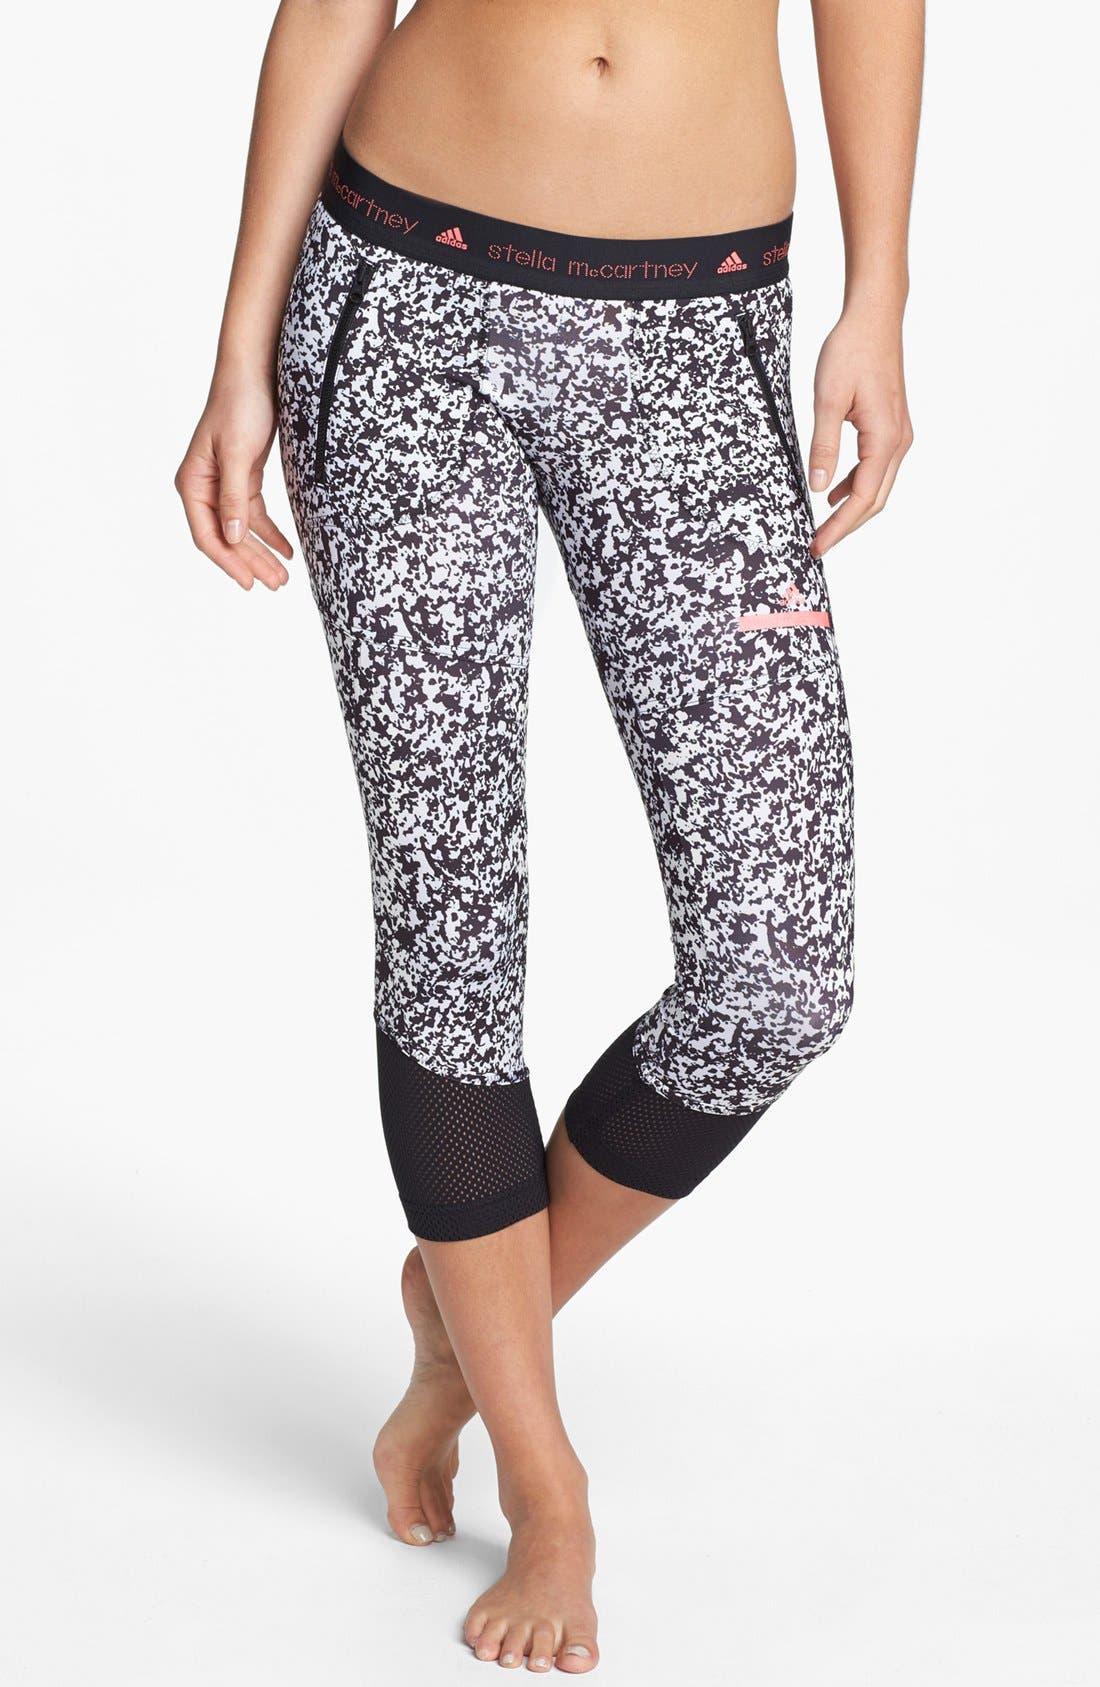 Alternate Image 1 Selected - adidas by Stella McCartney 'Run' Three Quarter Length Pants